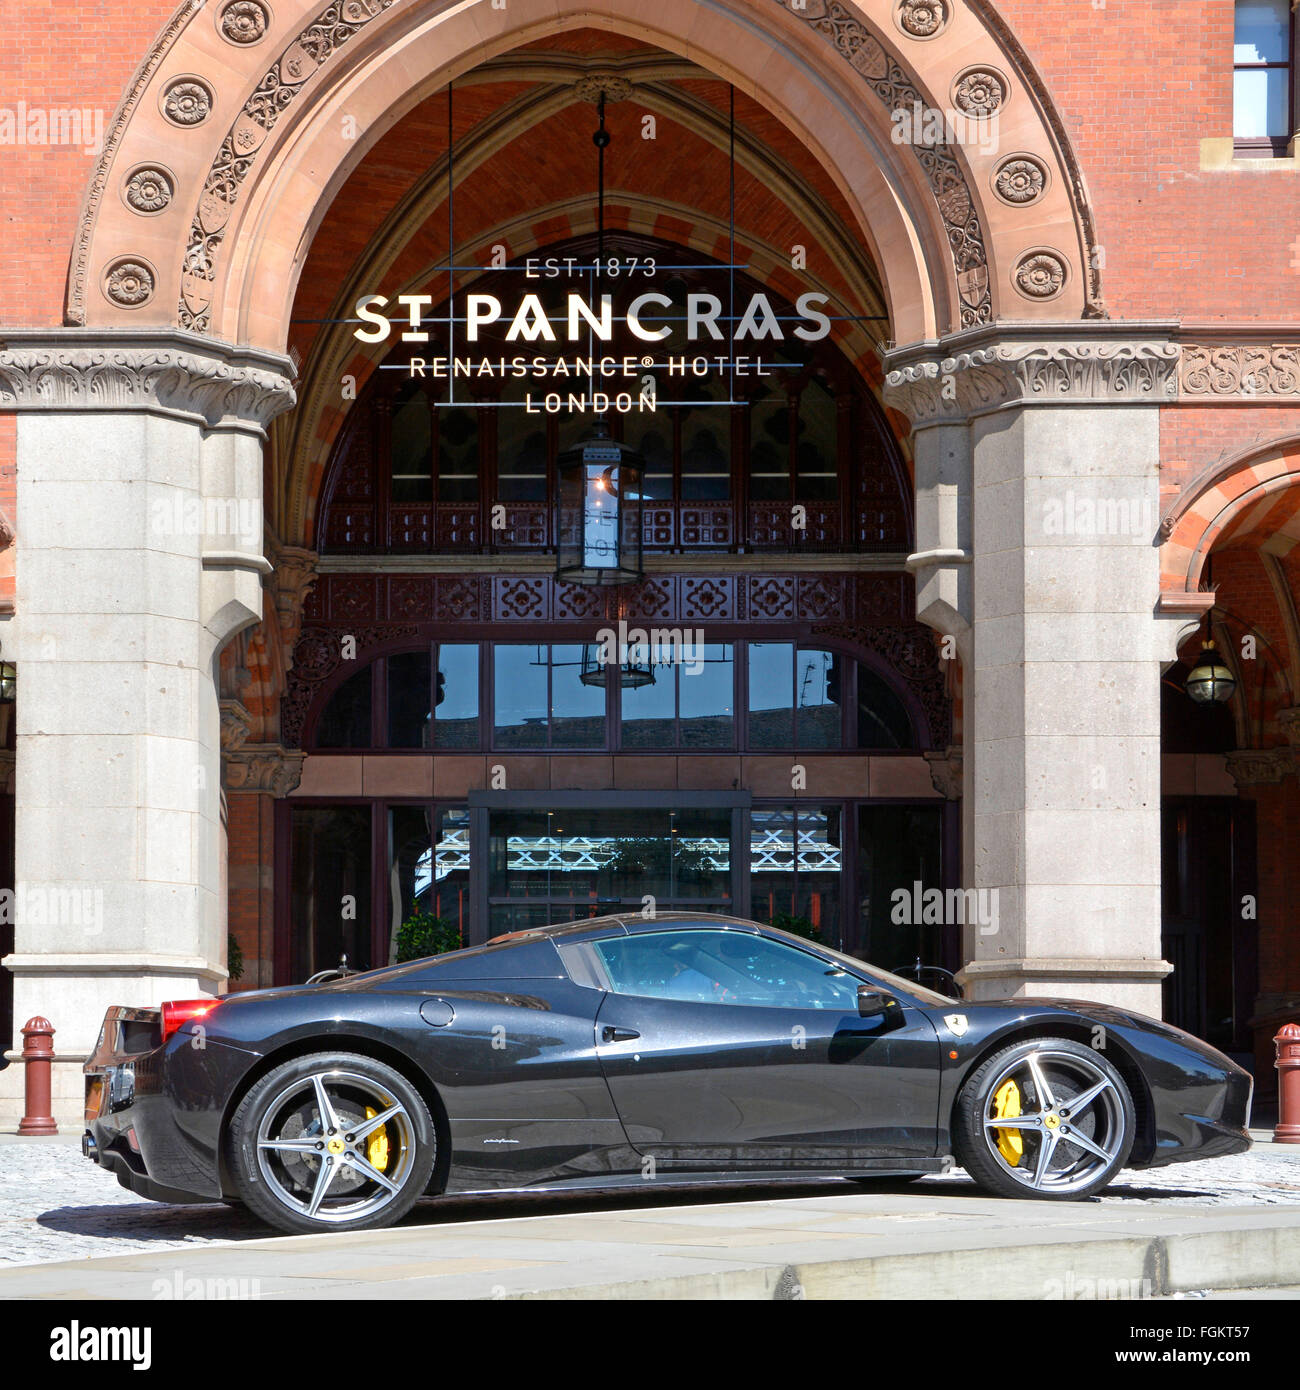 Ferrari luxury Italian sports car parked outside St Pancras Renaissance Hotel located  front of St Pancras Eurostar - Stock Image